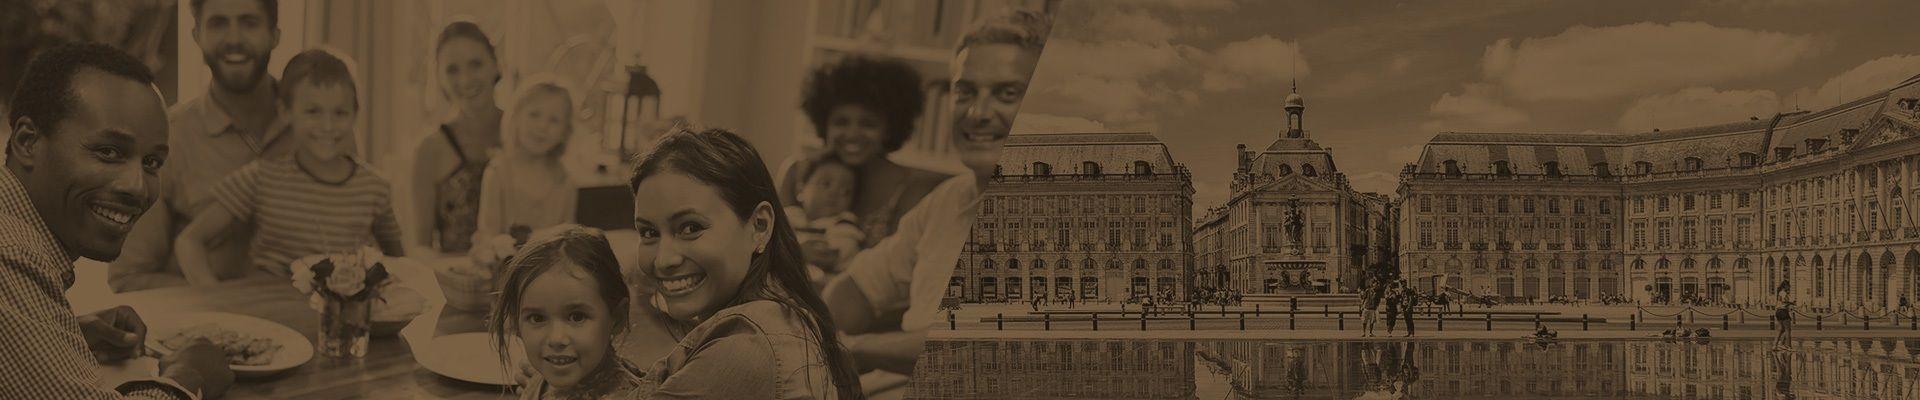 Investir en assurance vie - Cheval Blanc Patrimoine